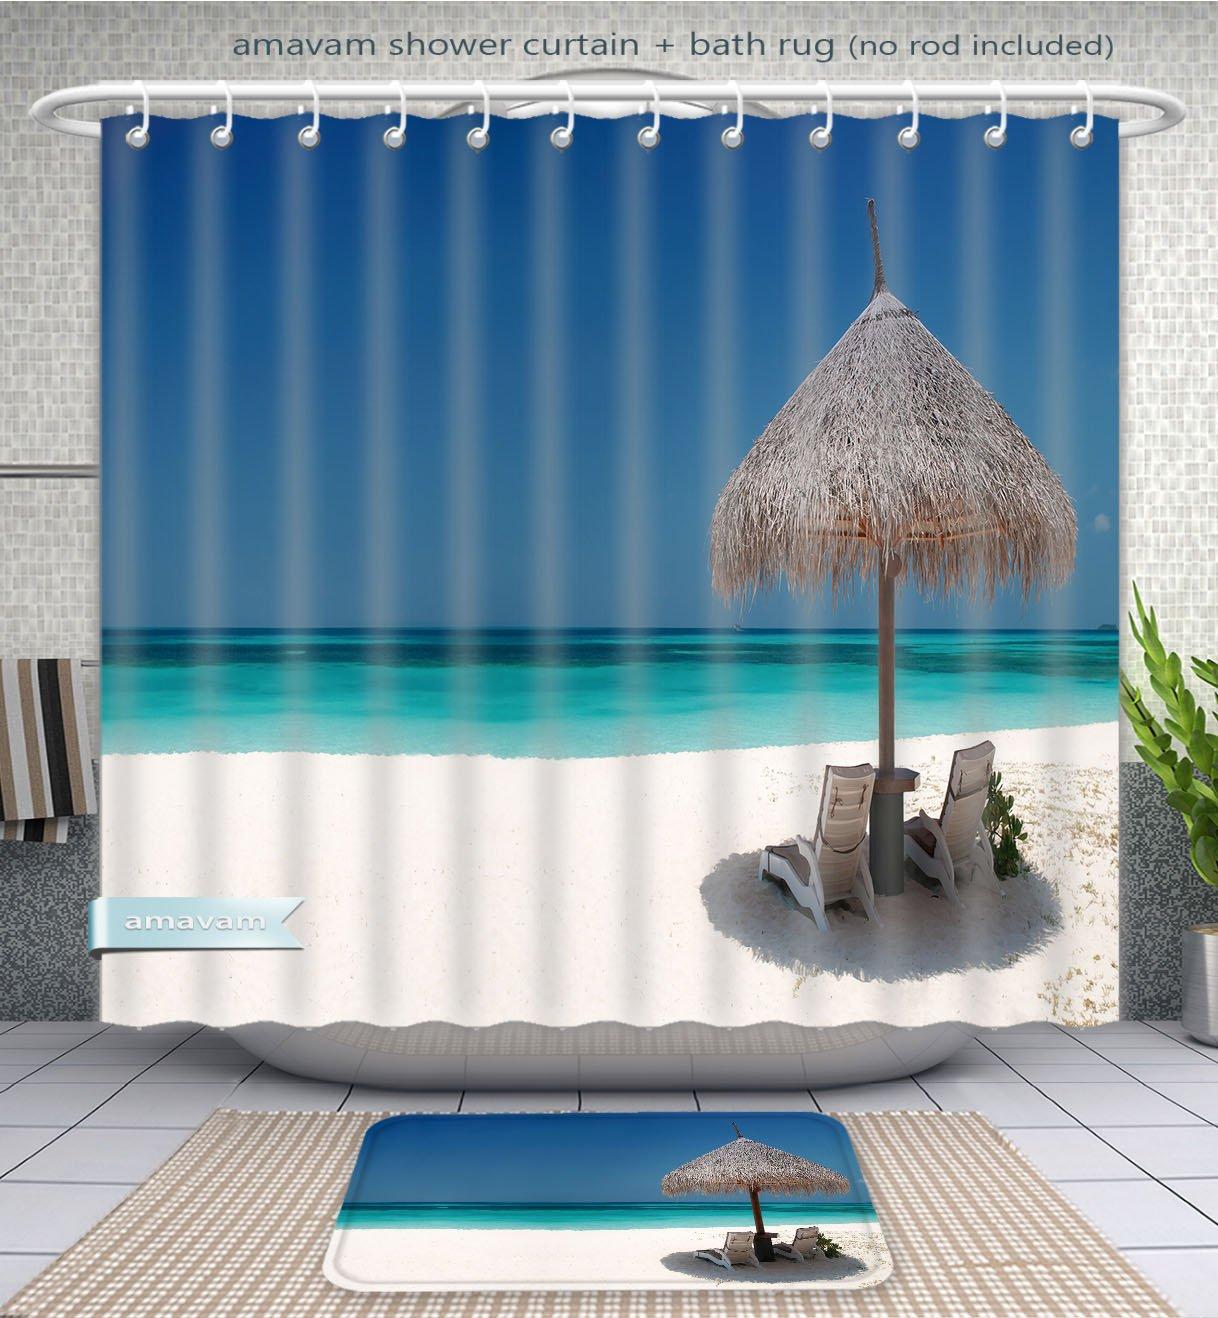 Amavam Bathroom 2-Piece Suit 18X1318-2X400 Shower Curtain And Bath Rug Set, 71''Wx79''H & 31''Wx20''H